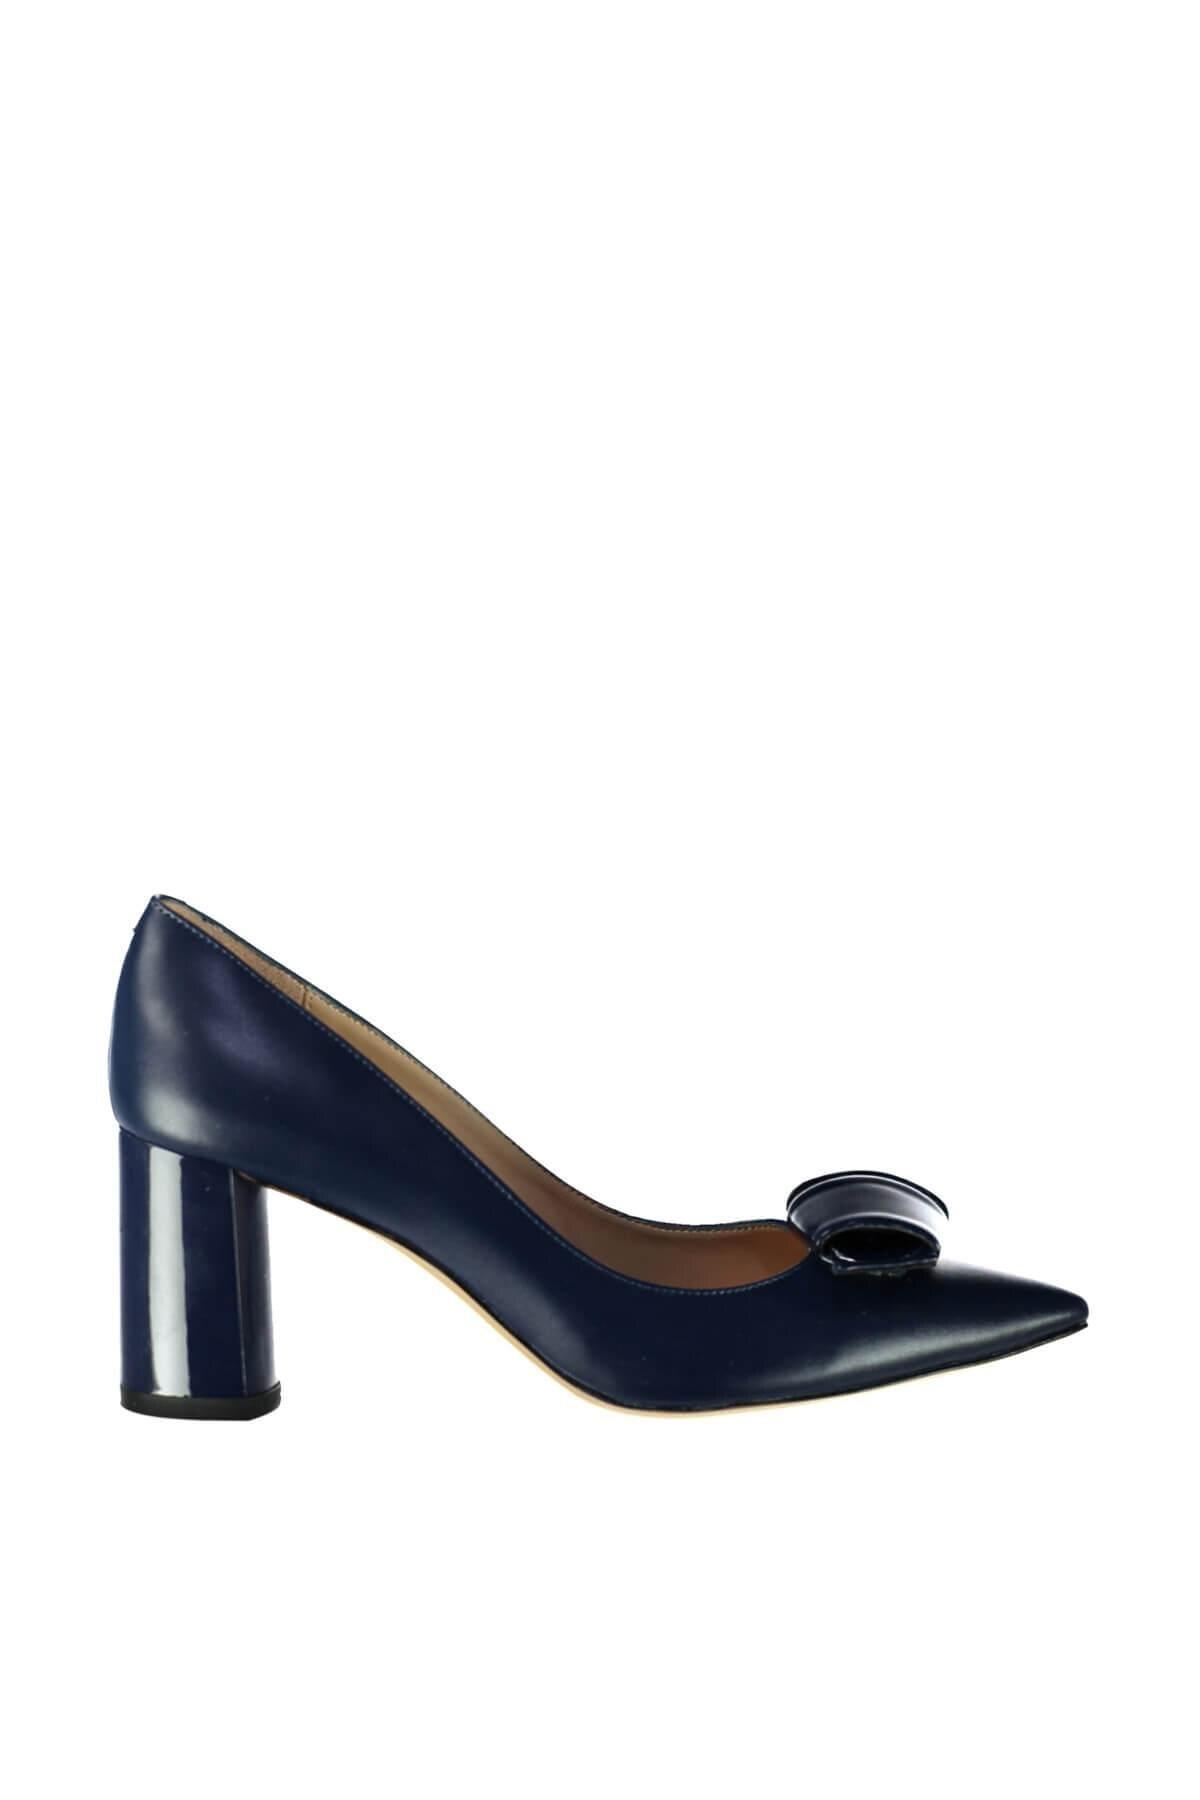 Pearl Dark Blue Women 'S High-Heeled Shoes 120130003686